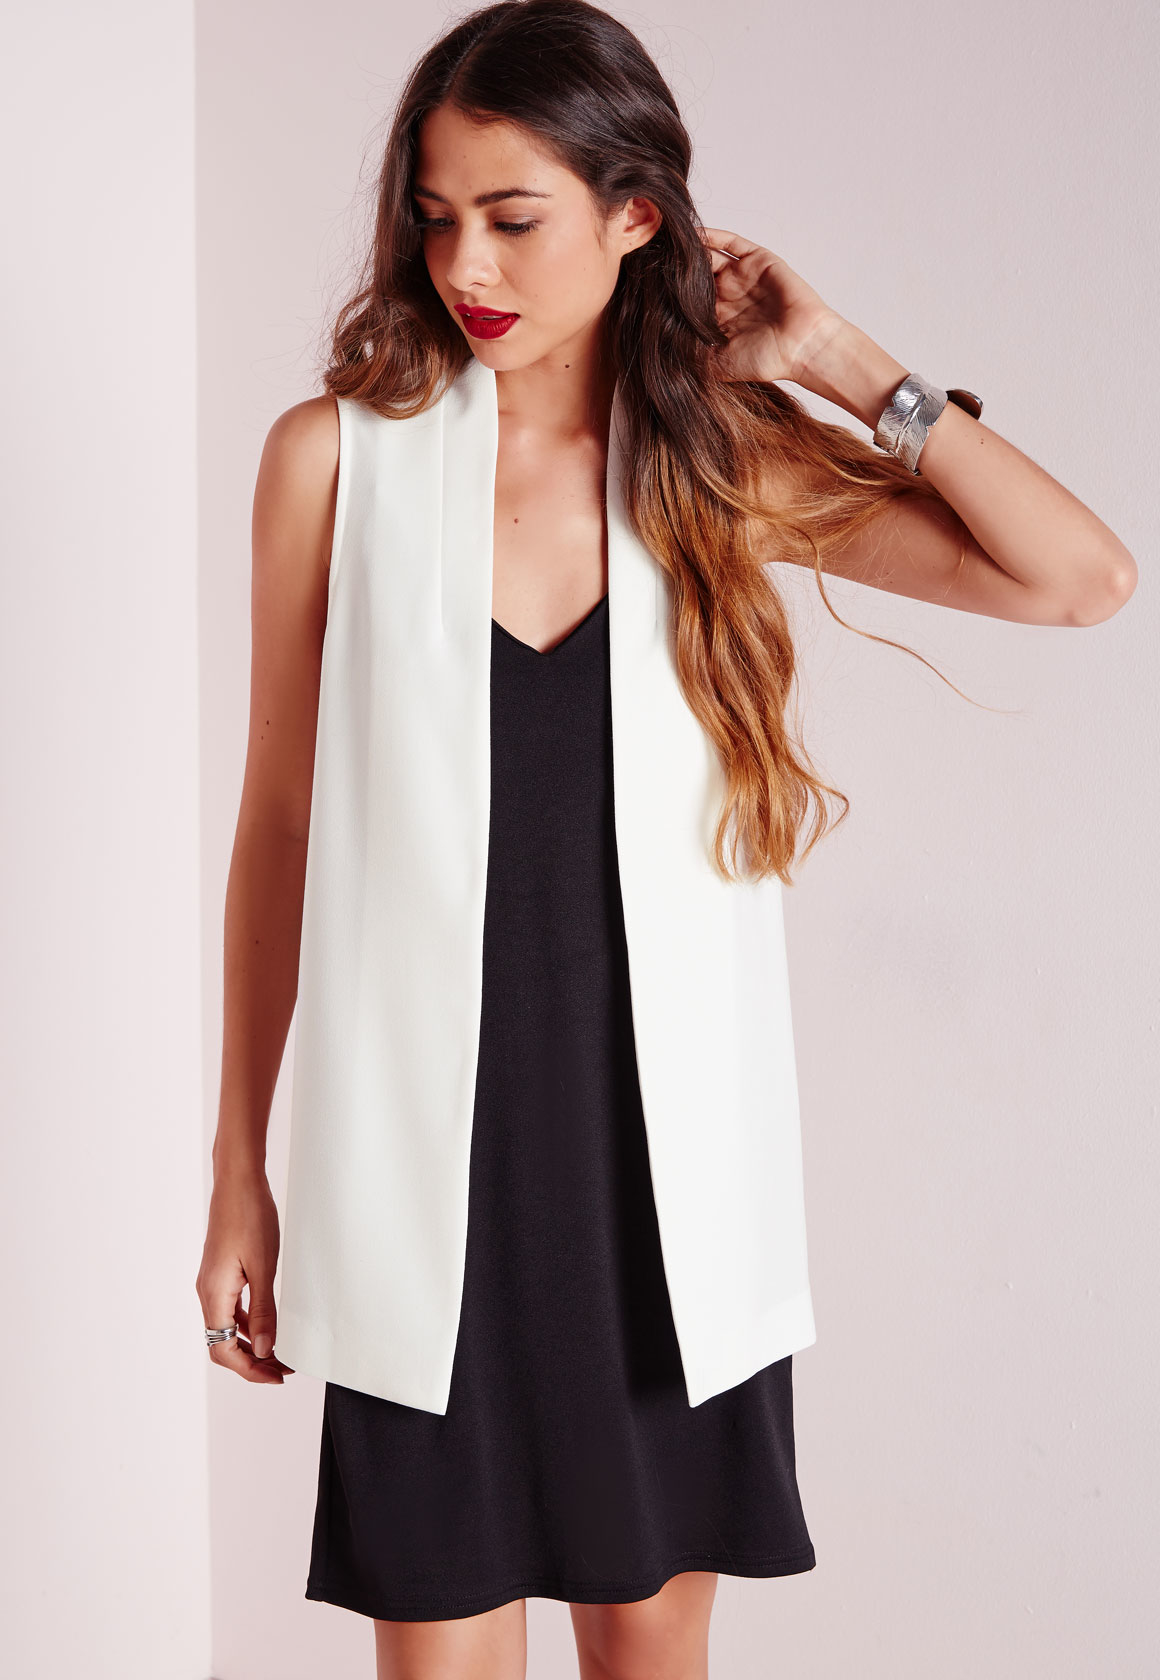 d4f695ae26c16 Lyst - Missguided Crepe Sleeveless Blazer White in White